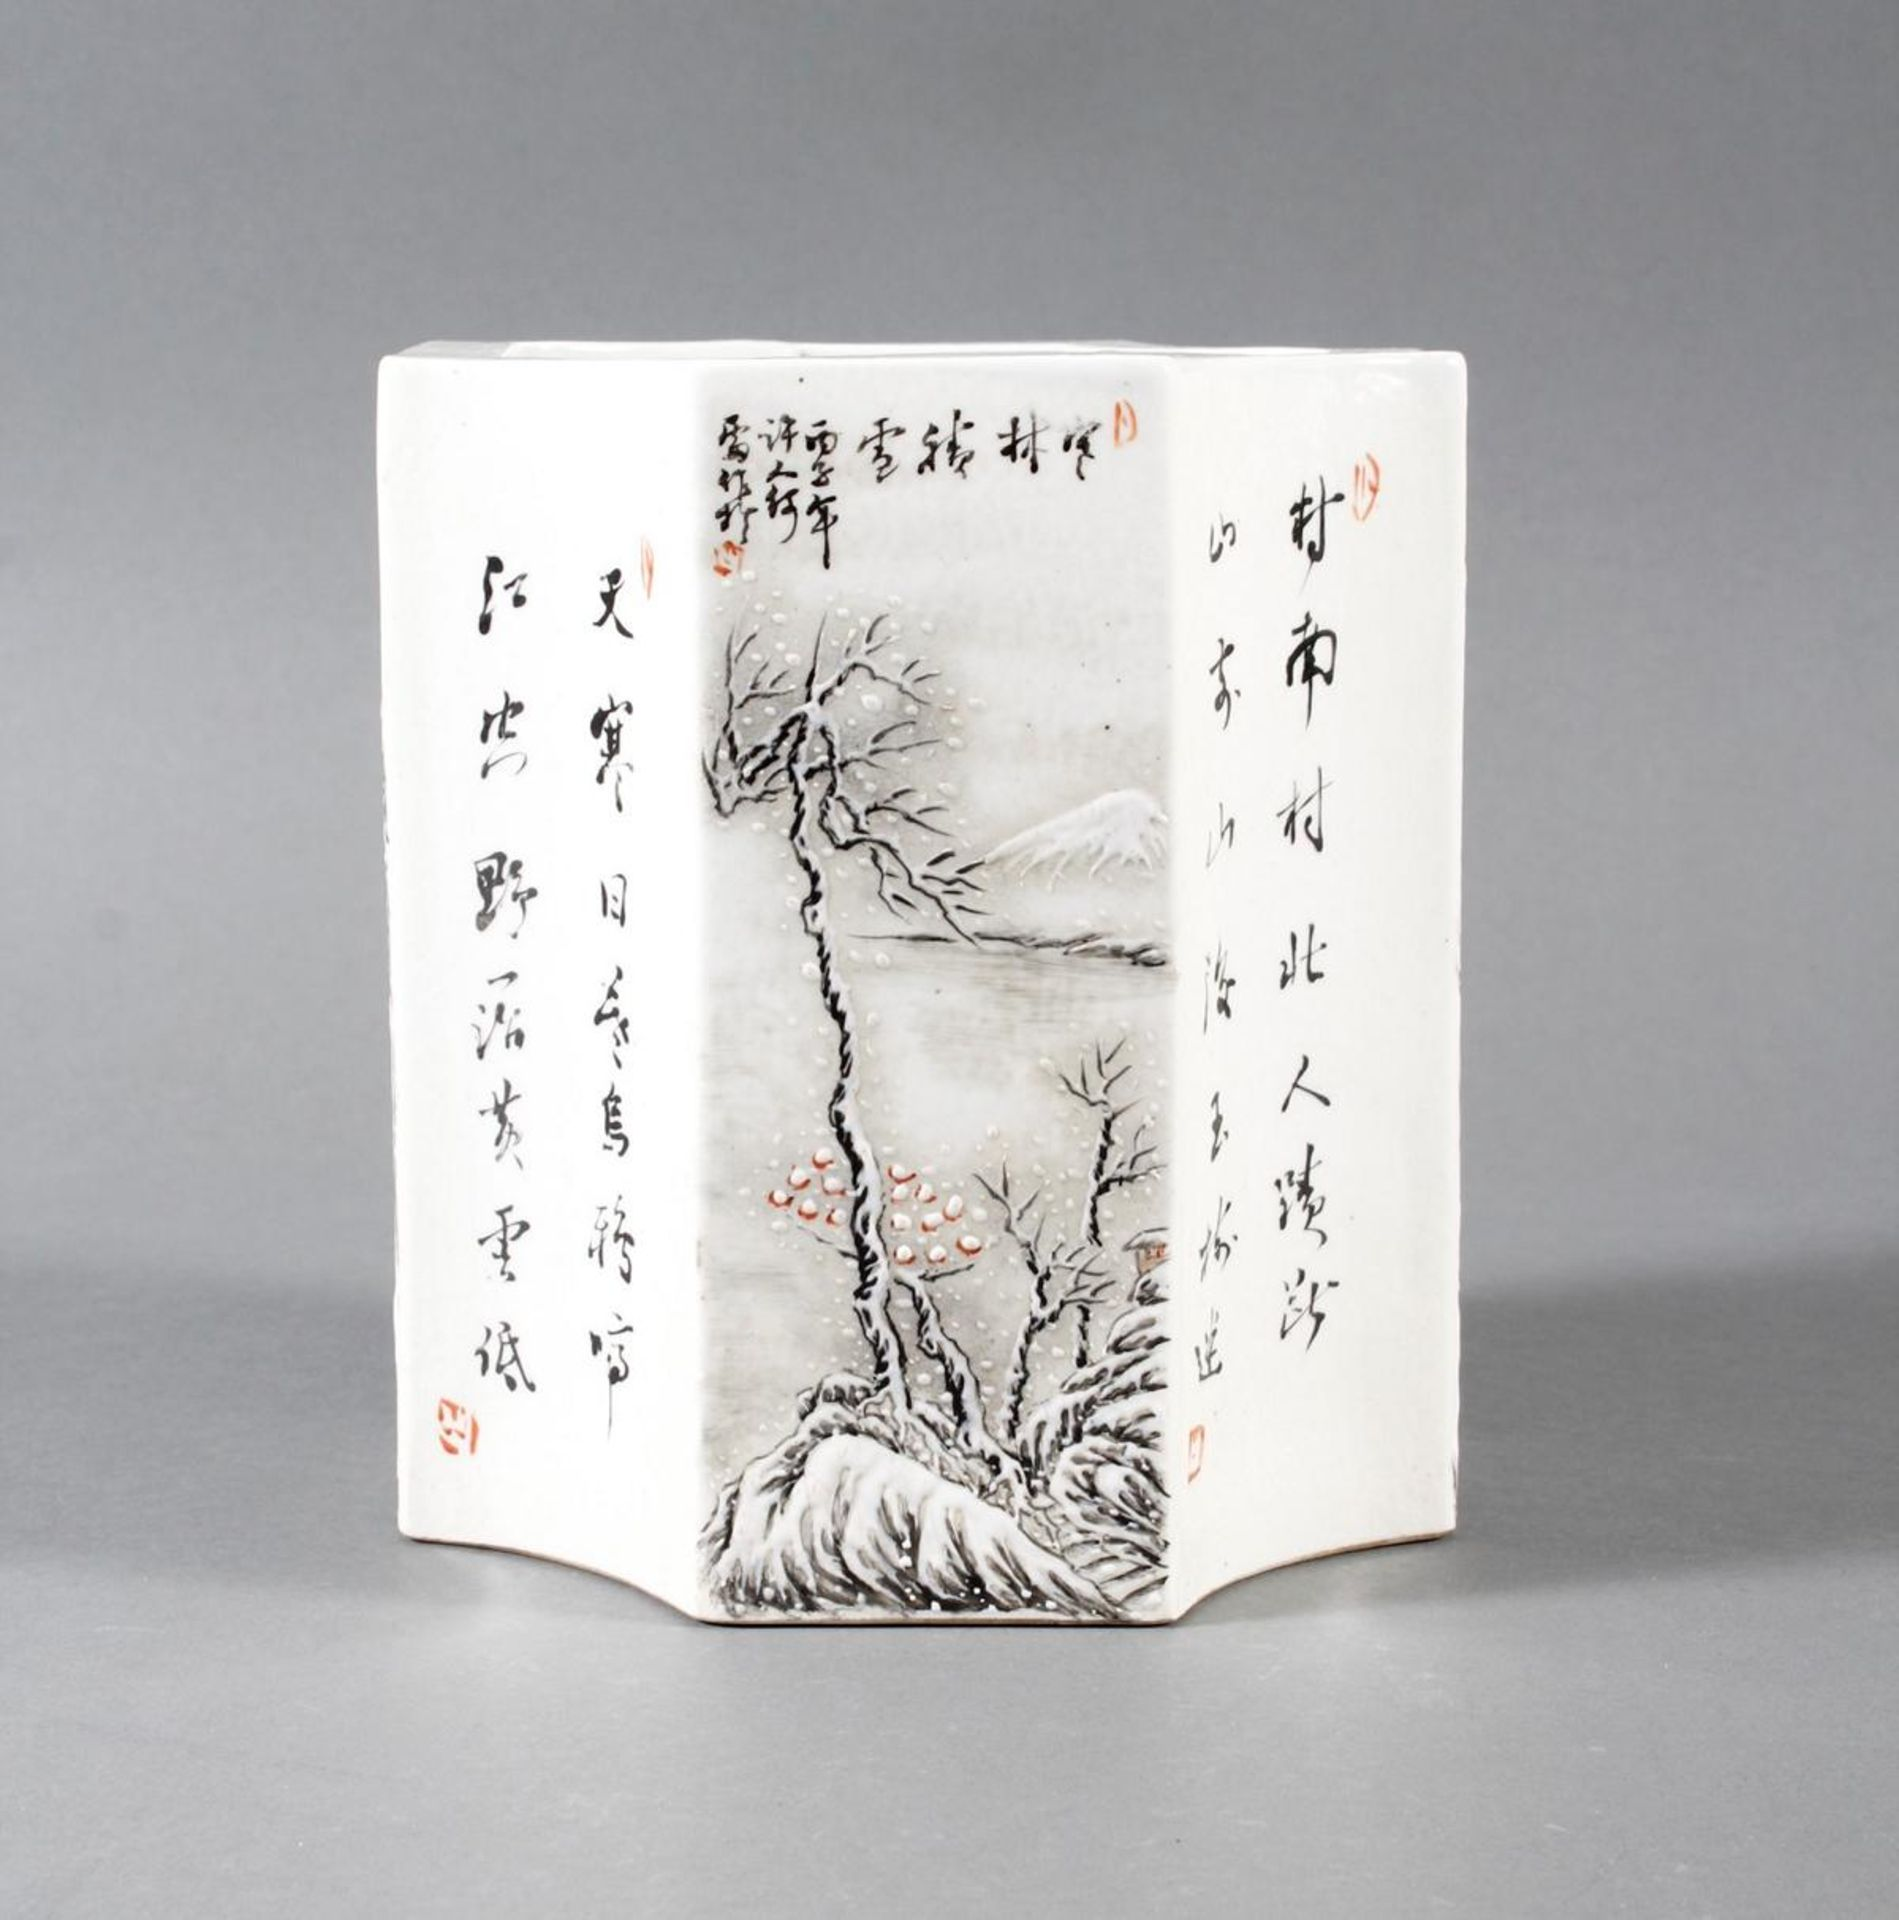 Porzellan-Pinselbehälter, China, Mitte 20. Jahrhundert